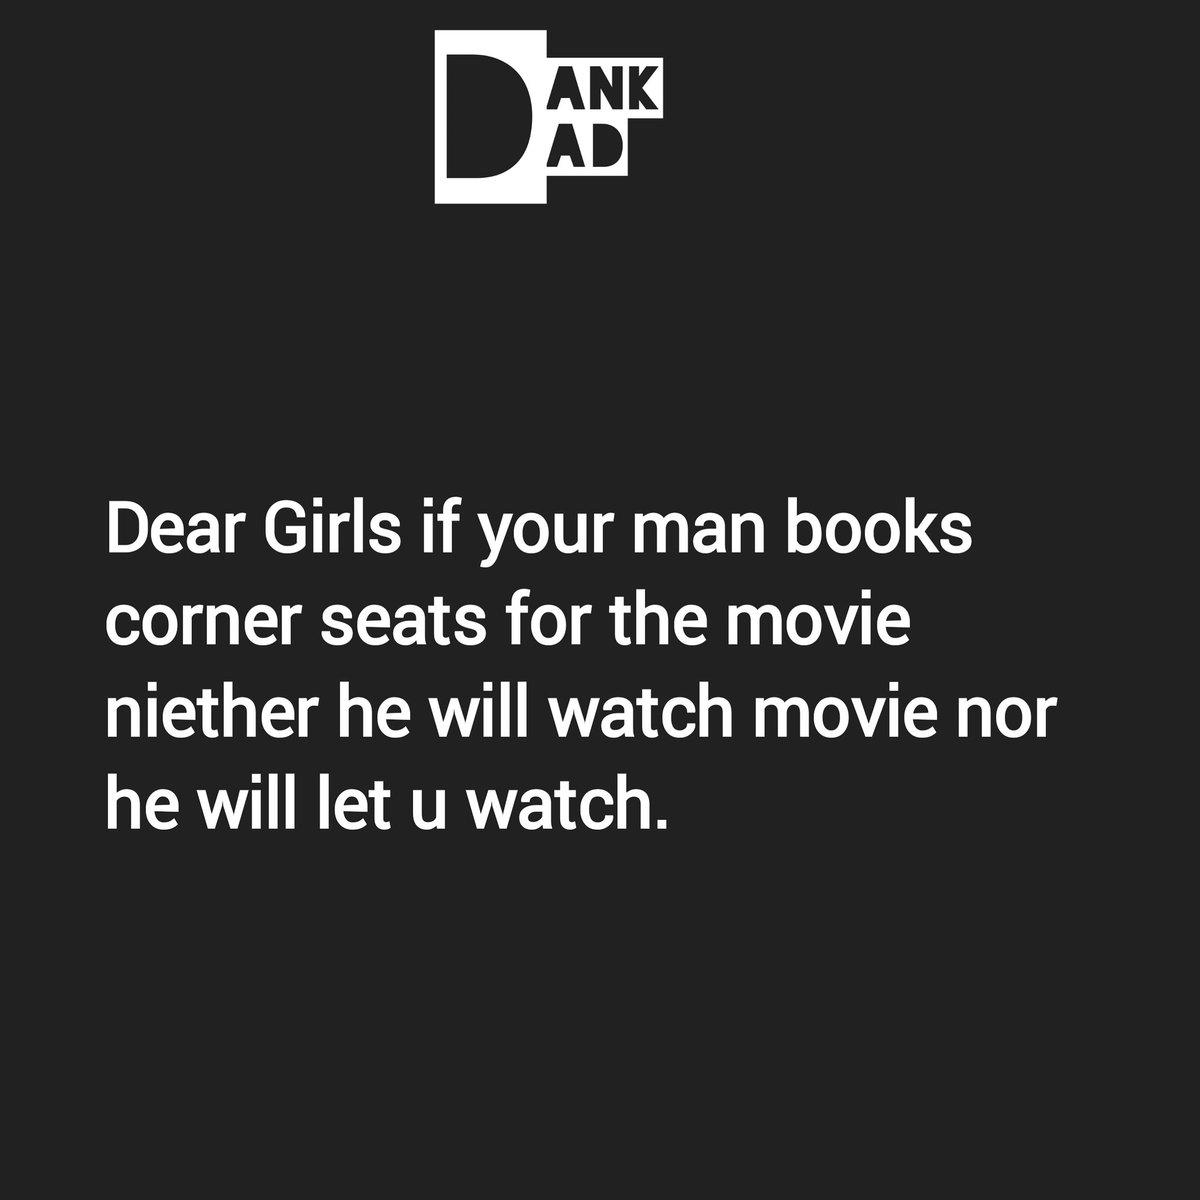 Follow @_dank_dad_ for more ....#jokeoftheday  #dankjokes #jokes #nonvegjokes  #sarcasm  #comedyindia #bakchodi #chutiyapa  #sacredmemes #bollywood #sarcasticmemes #bcbilli #rvcj #bakchodiyanpic.twitter.com/ZWm1Vhfy8B